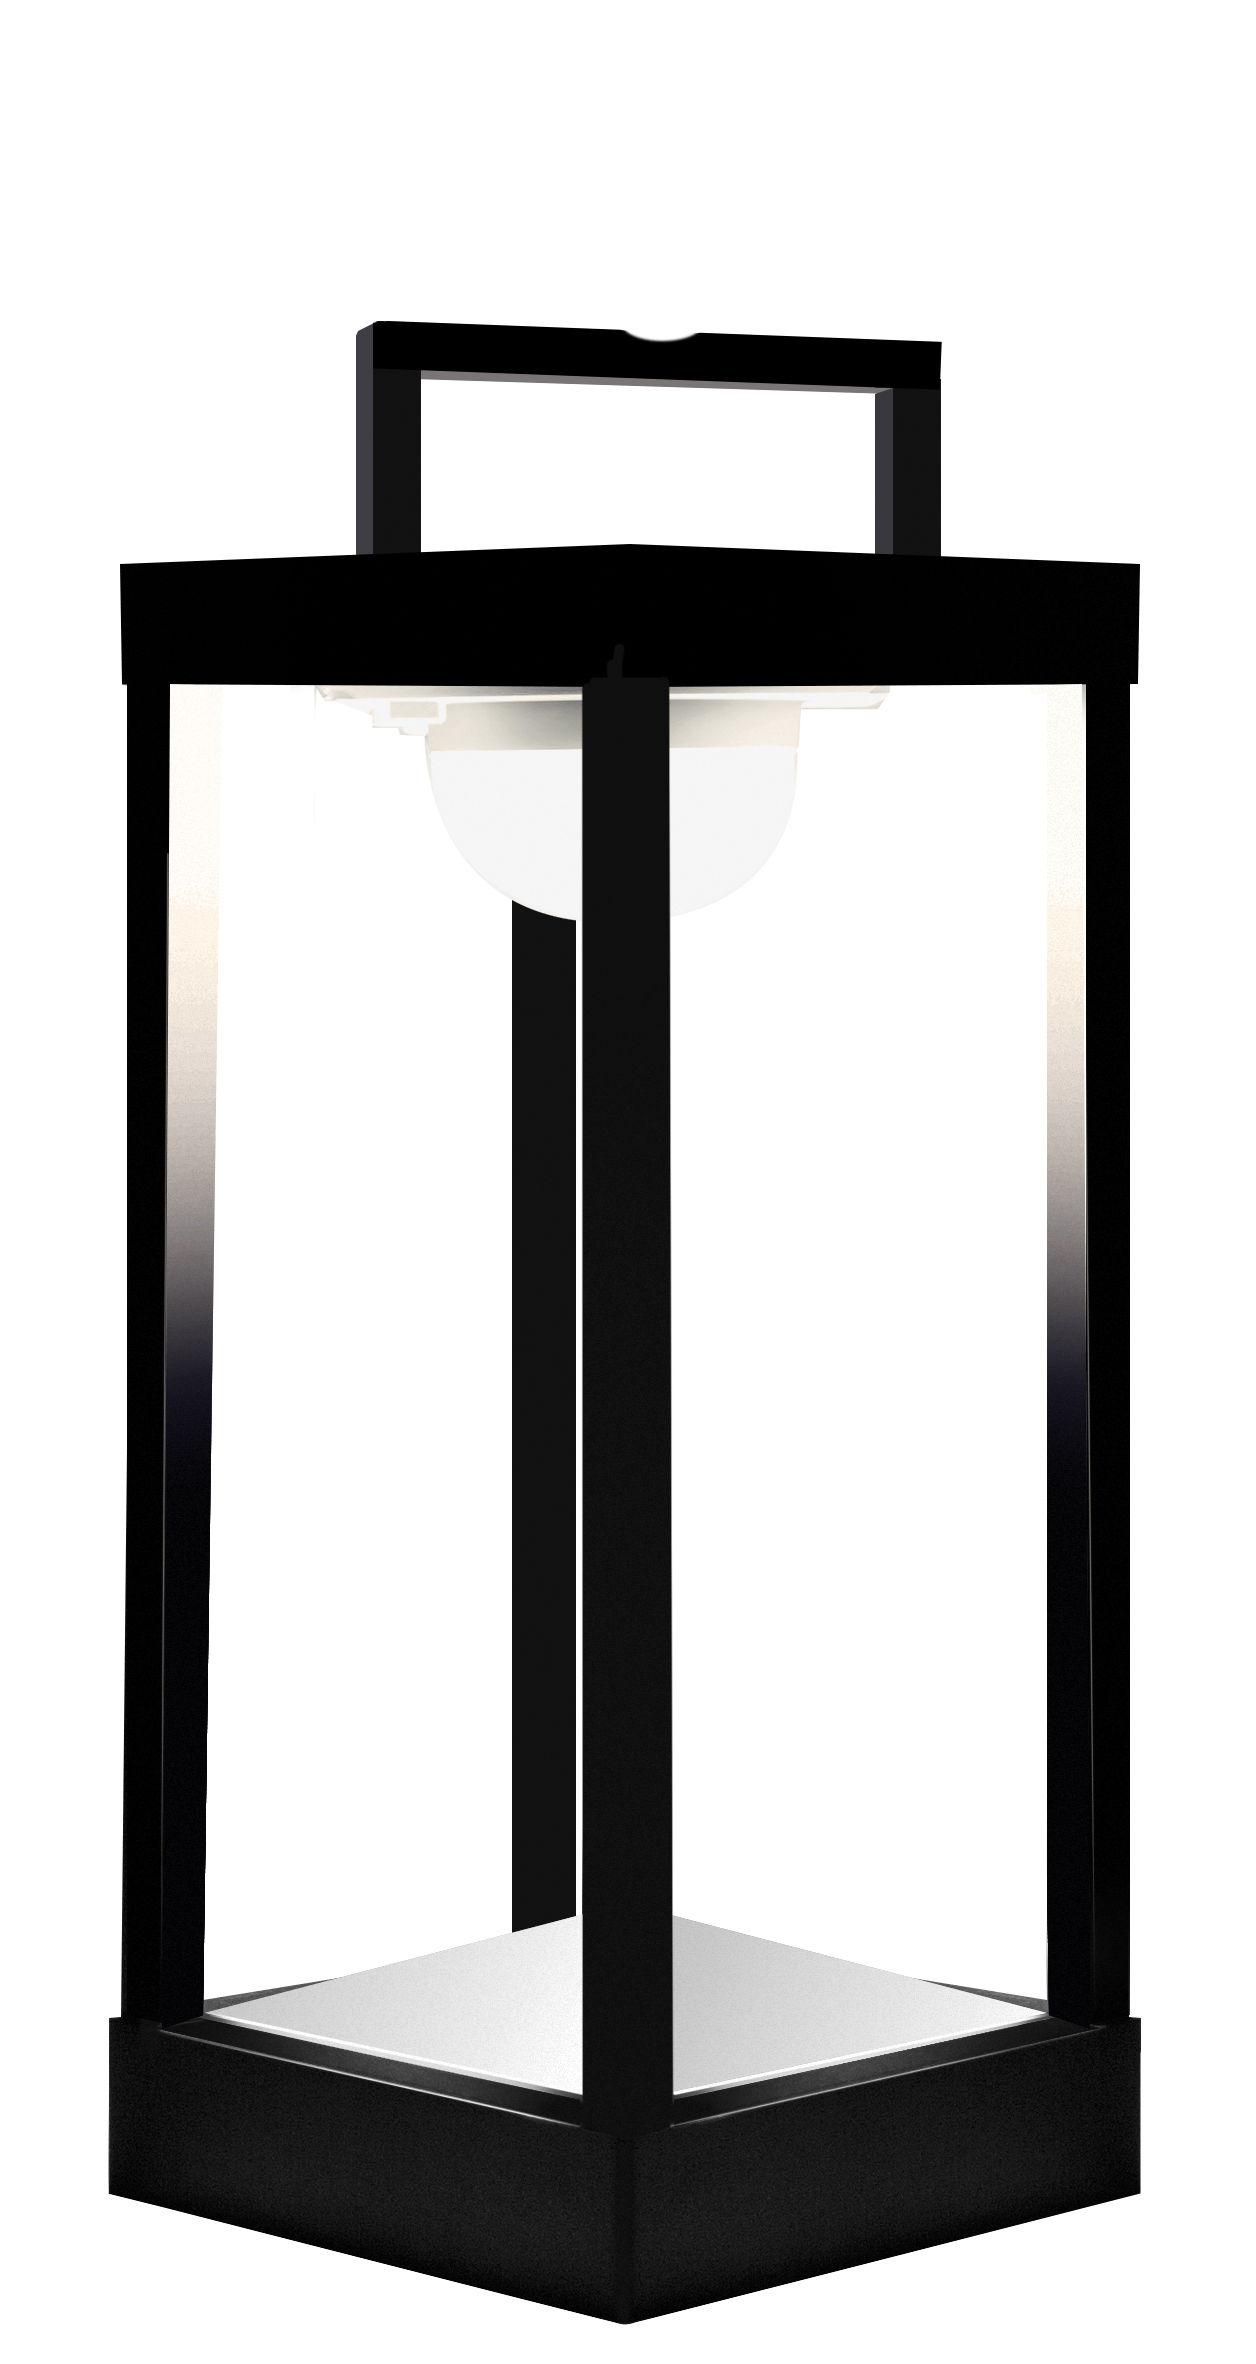 Leuchten - Tischleuchten - La Lampe Parc M Solarlampe LED / kabellos - H 40 cm - Maiori - Schwarz - Aluminium, Glas